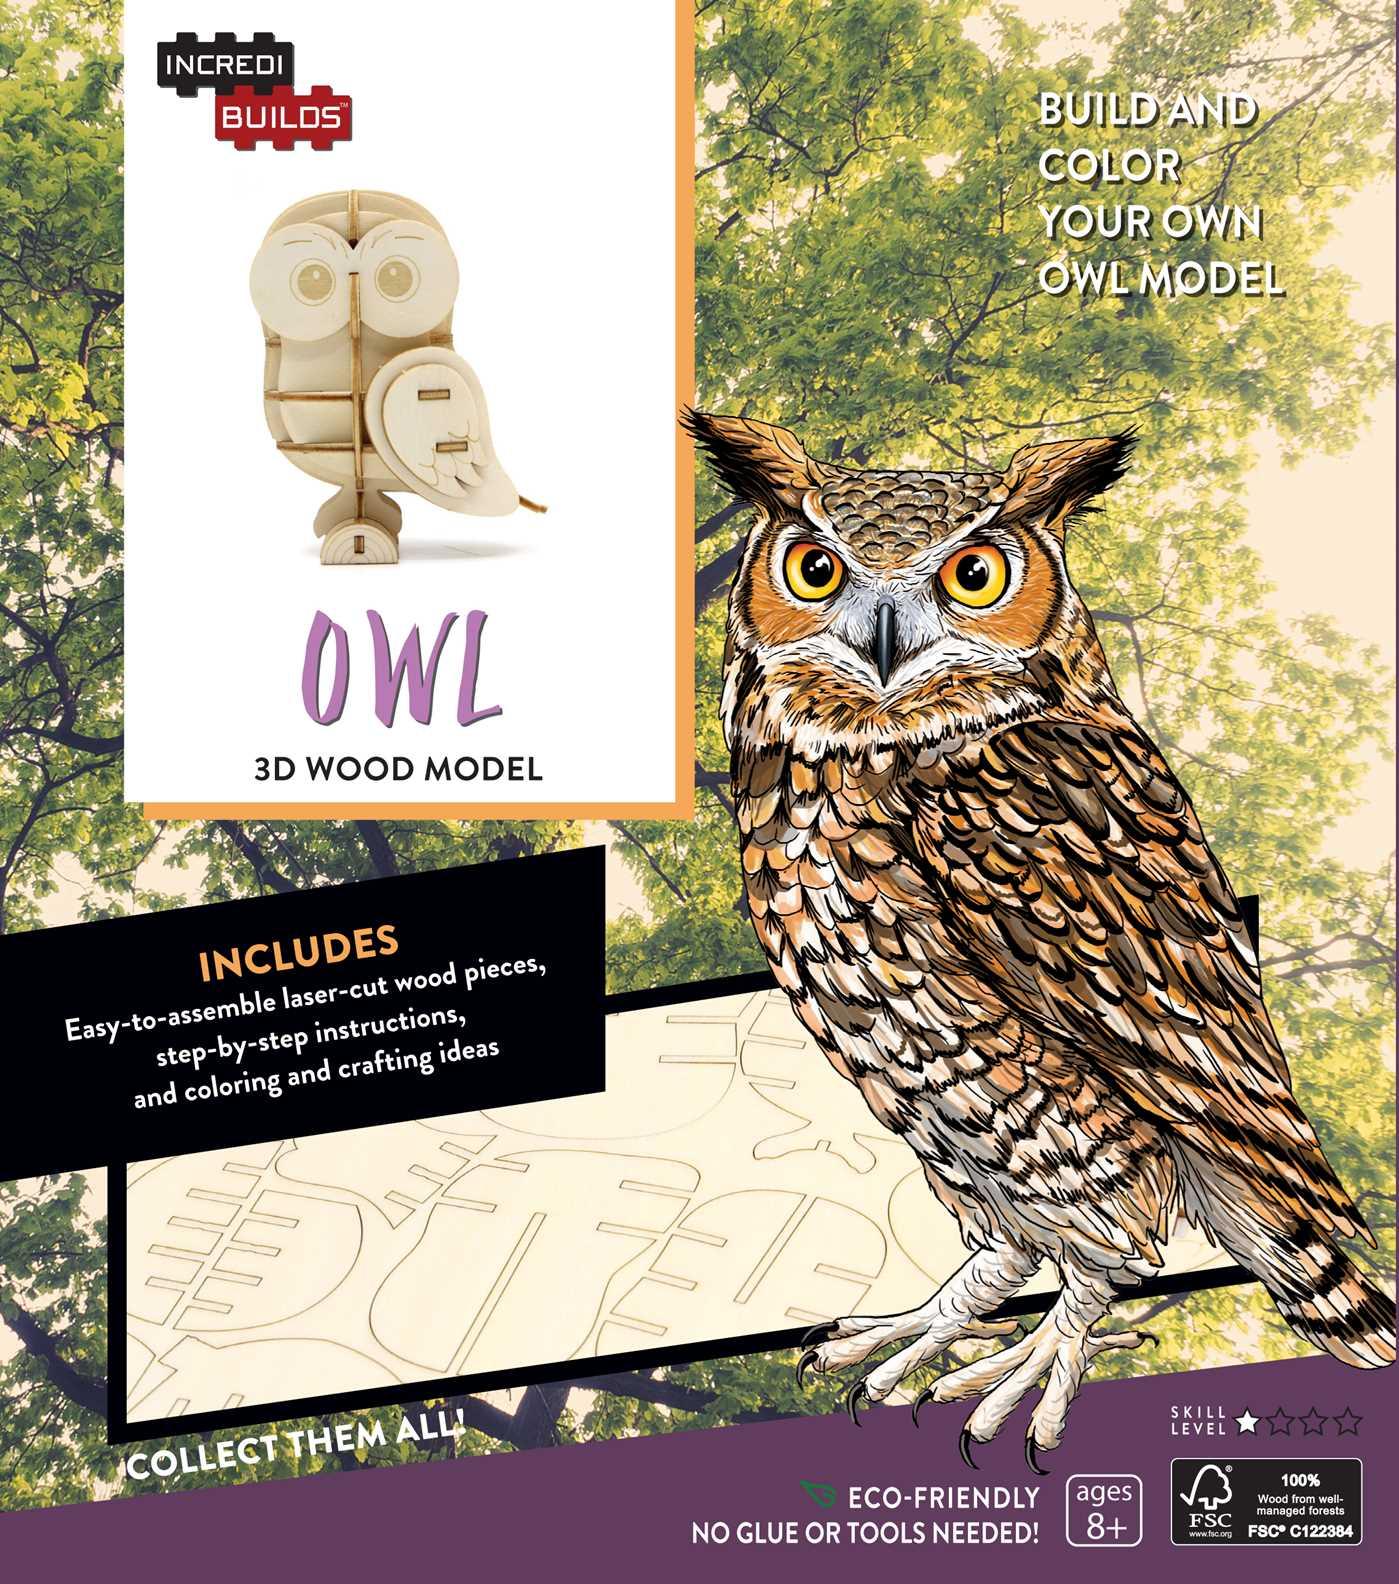 Incredibuilds owl 3d wood model 9781682980408 hr